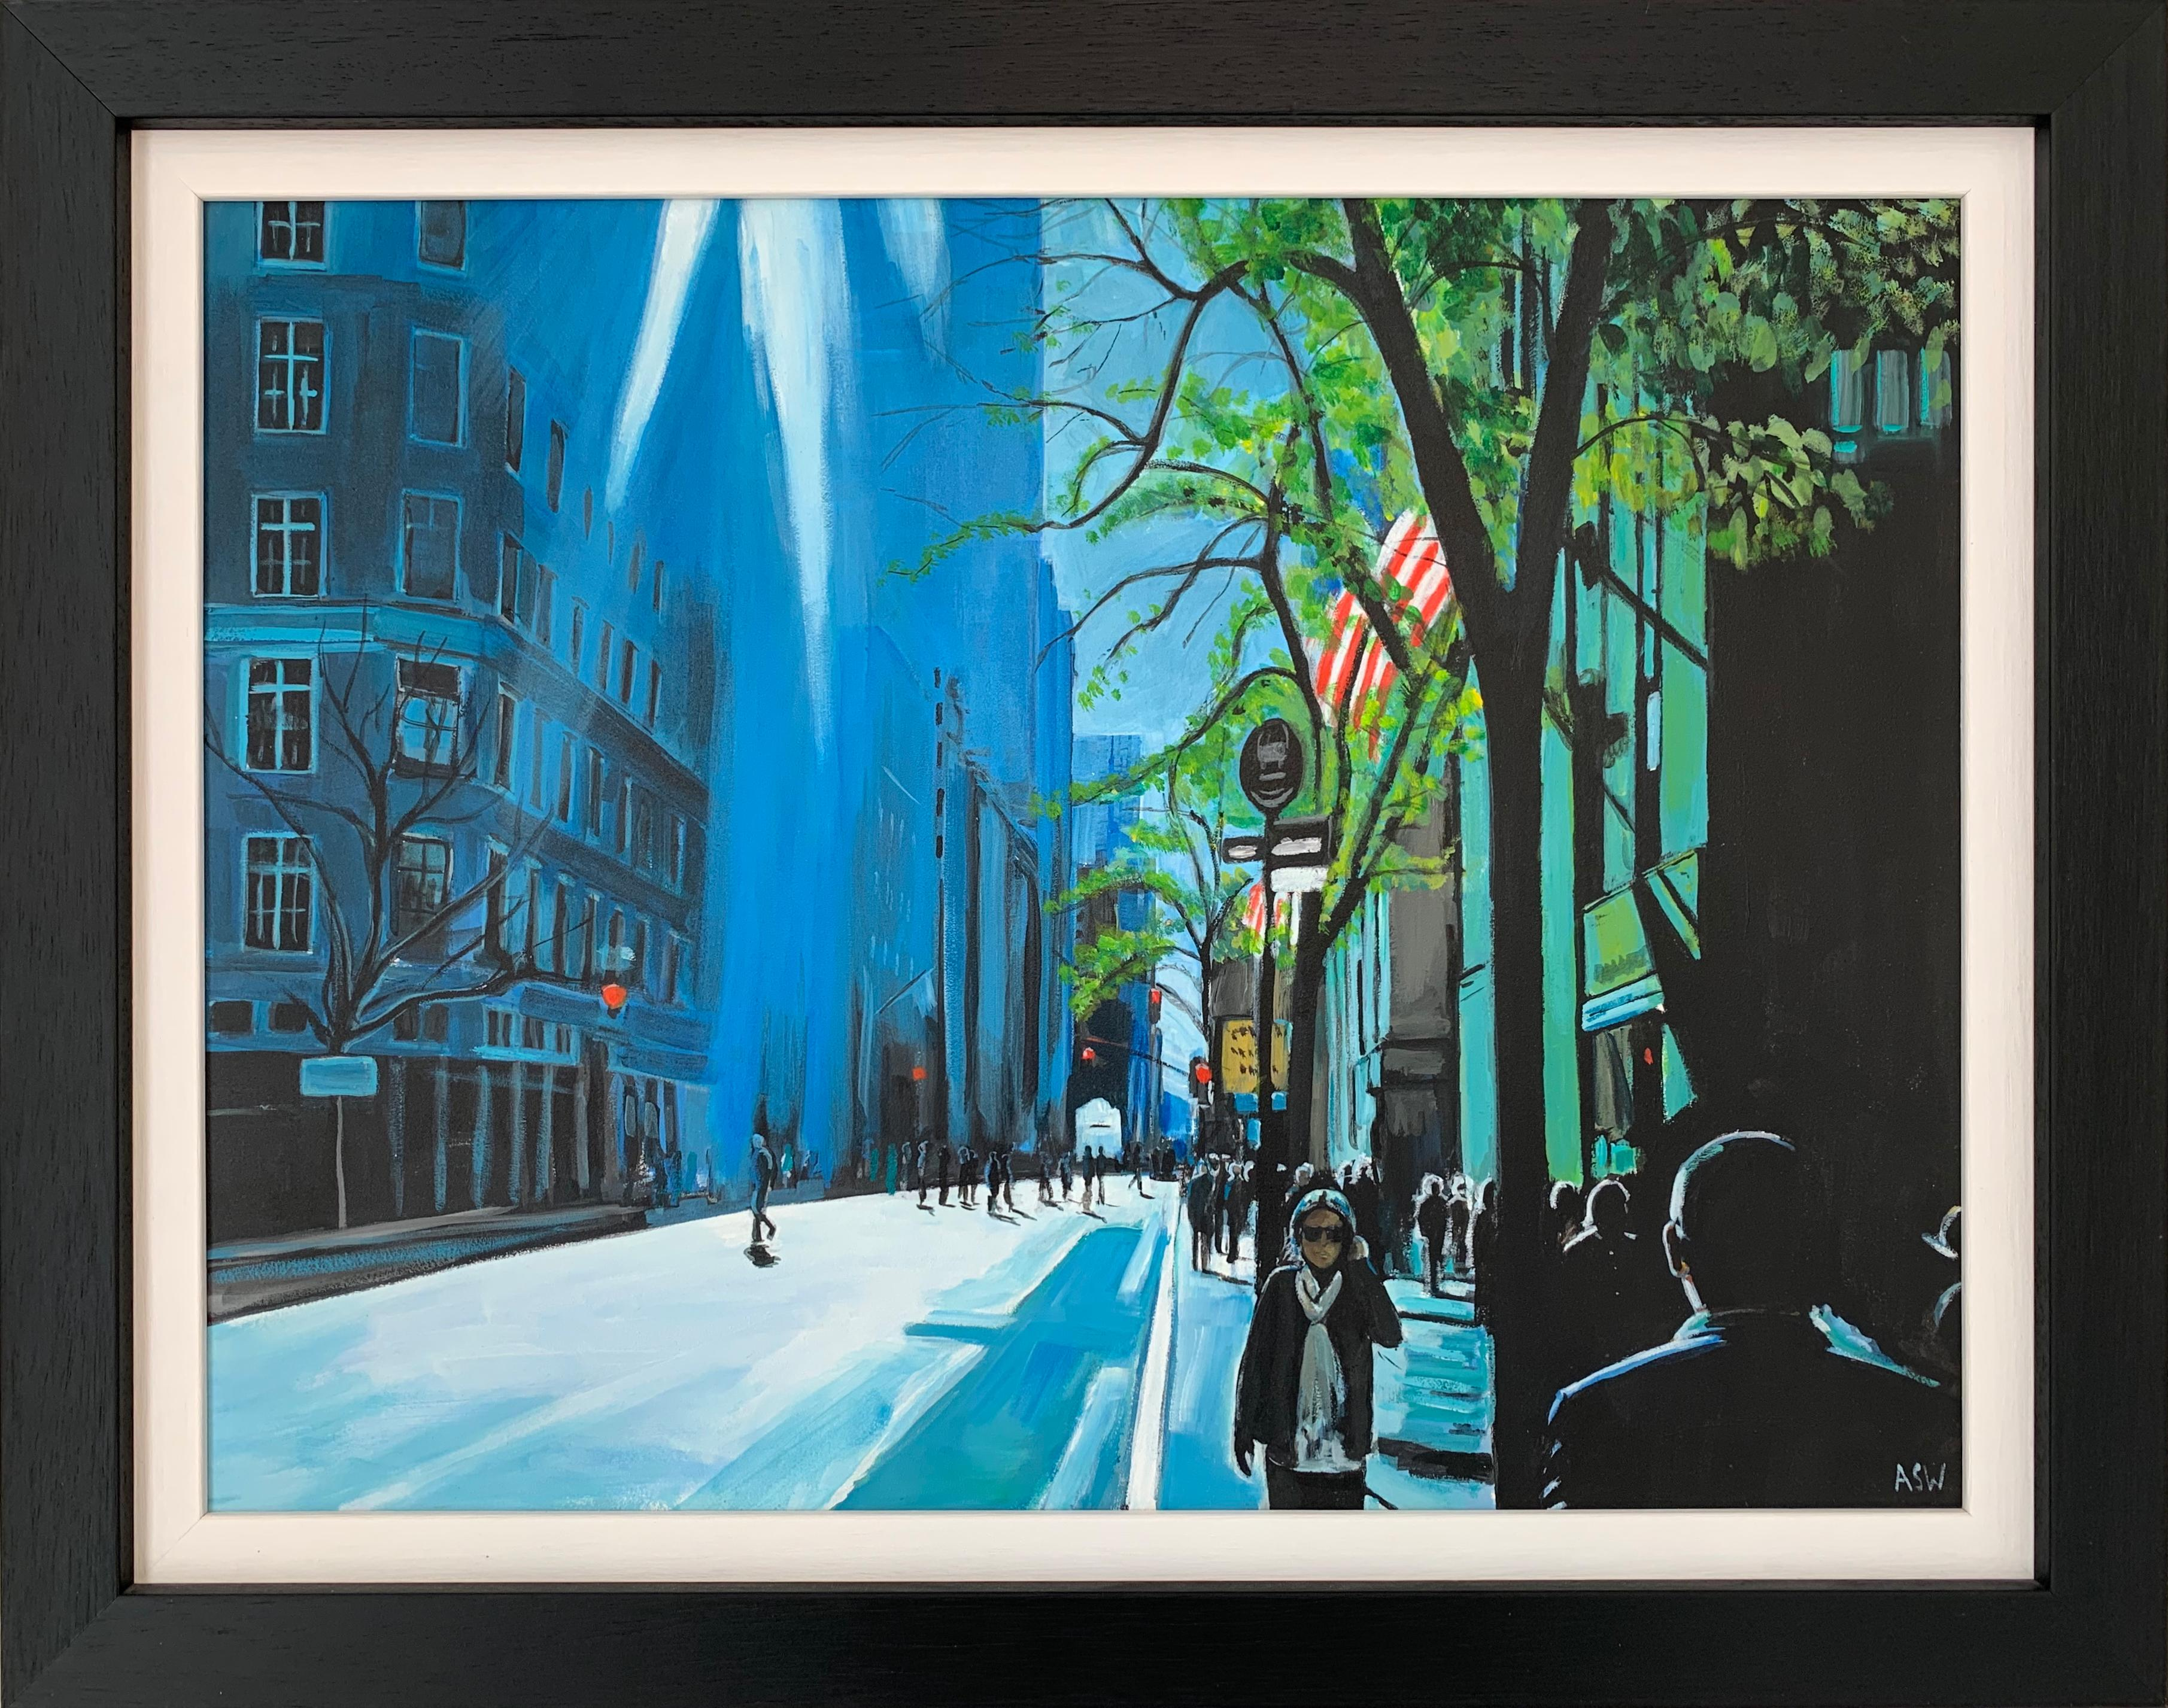 Blue Sky in New York City Sun by British Contemporary Urban Landscape Artist